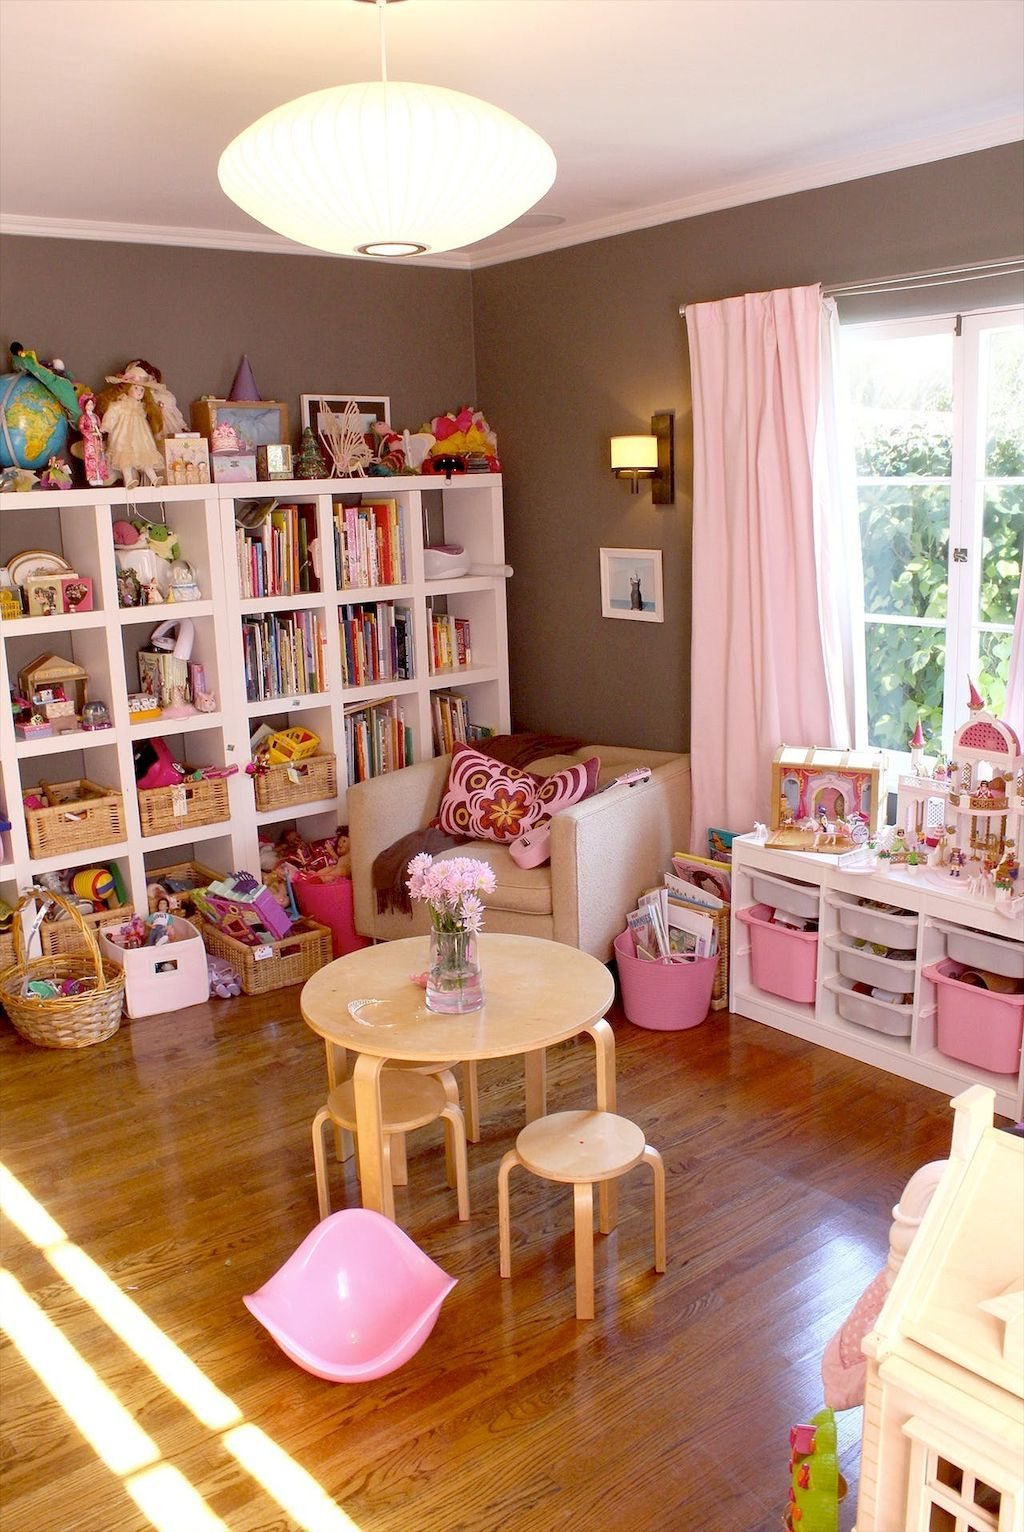 40 Summer Playroom Ideas For Girls And Boys Girls Playroom